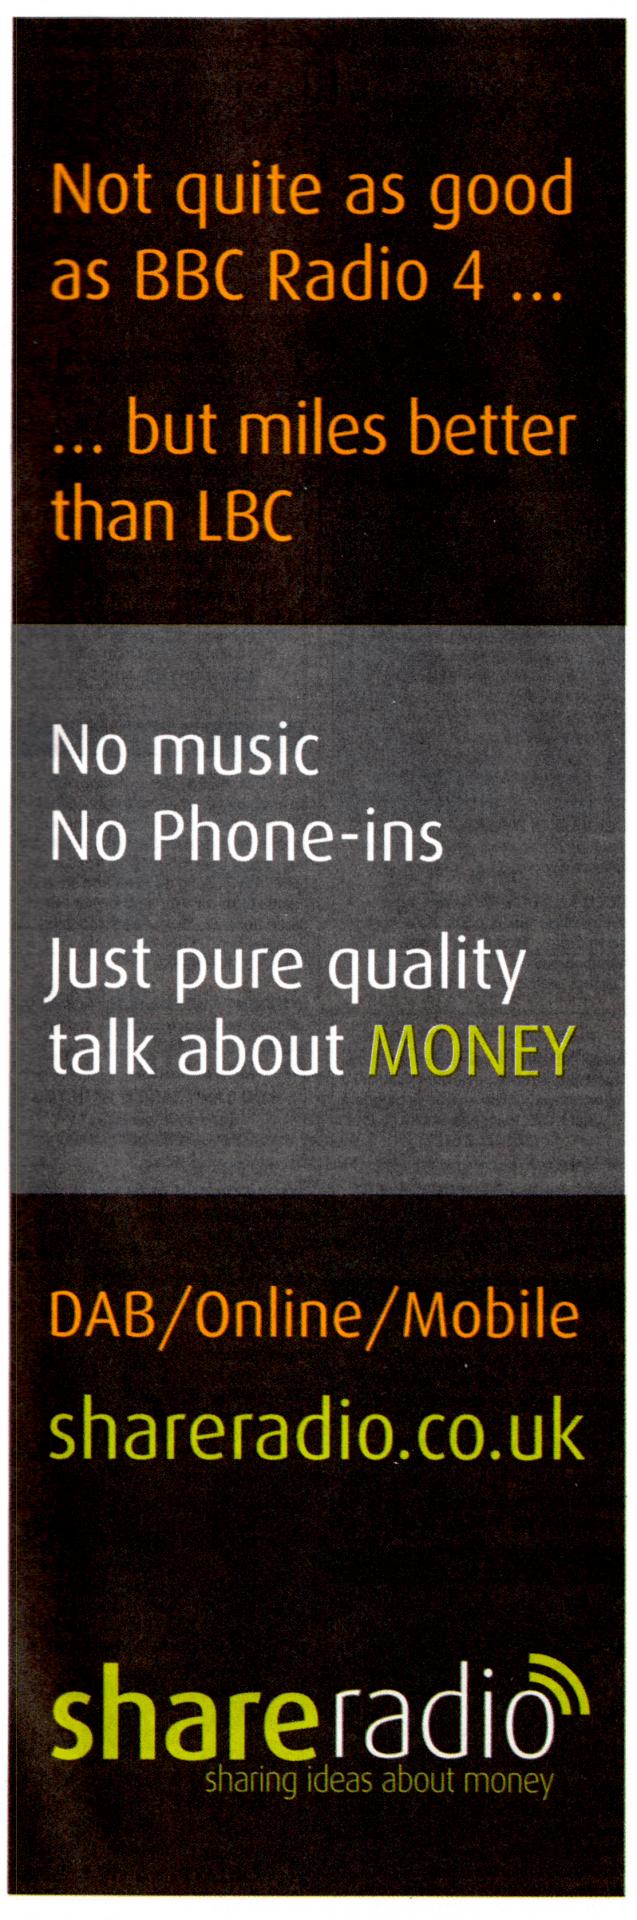 Share Radio comparative ad